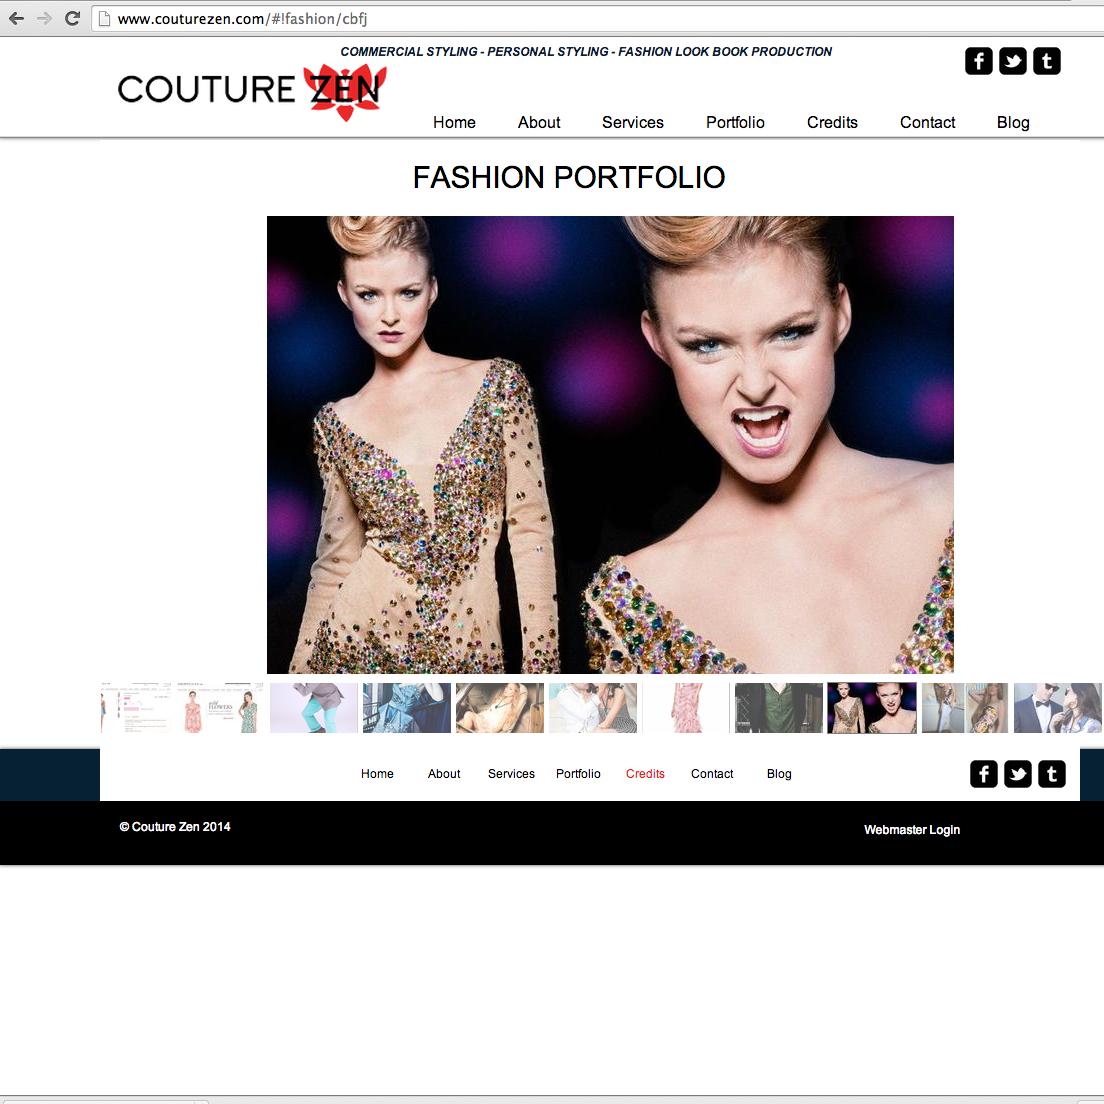 oknik, hair, makeup, FHM, model, miss October, Jeffrey Nelson Photography, shoptiques, fashion photographer, los angeles, red carpet, celebrity